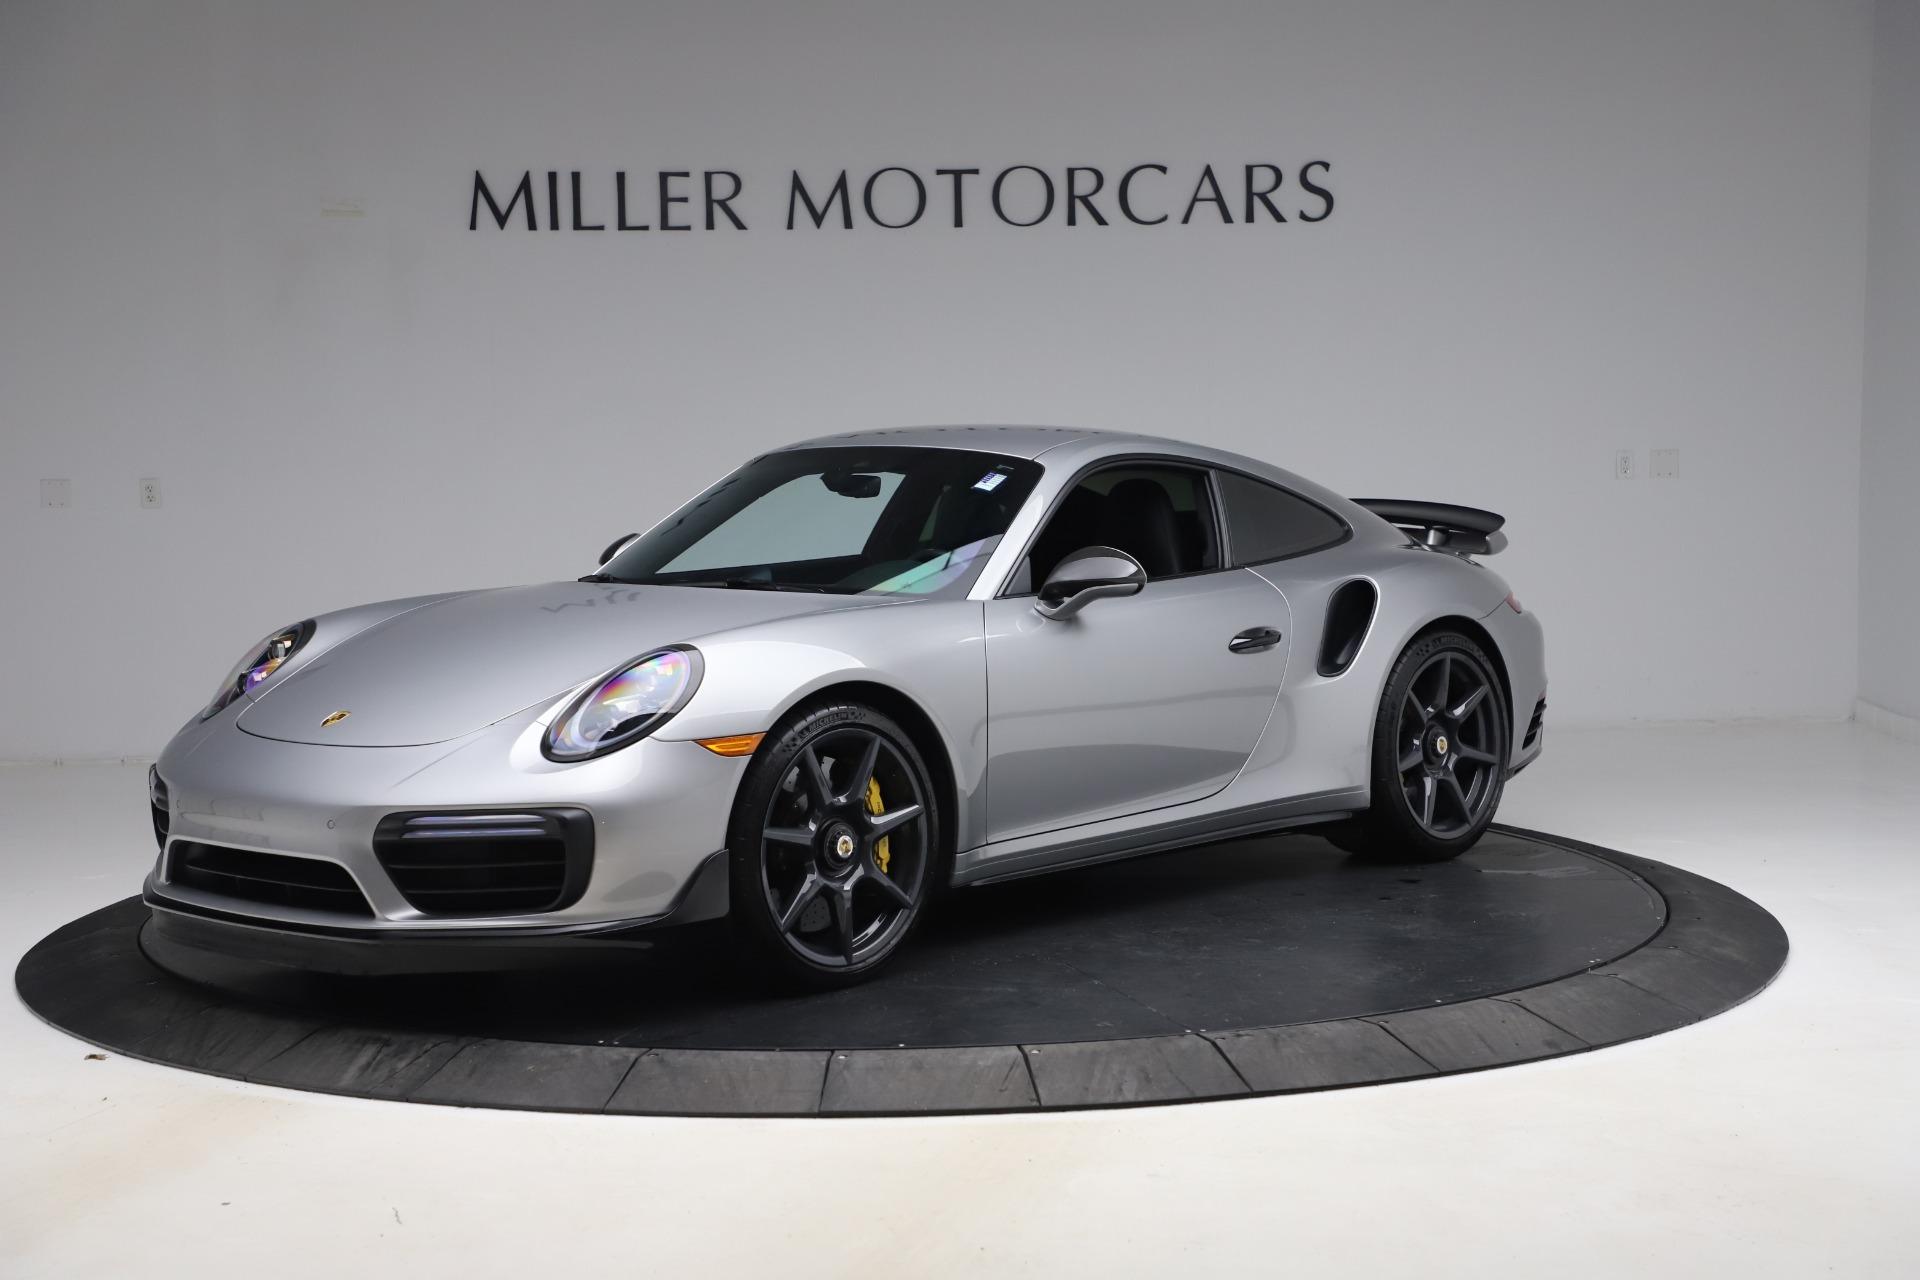 Used 2019 Porsche 911 Turbo S for sale $177,900 at Alfa Romeo of Greenwich in Greenwich CT 06830 1